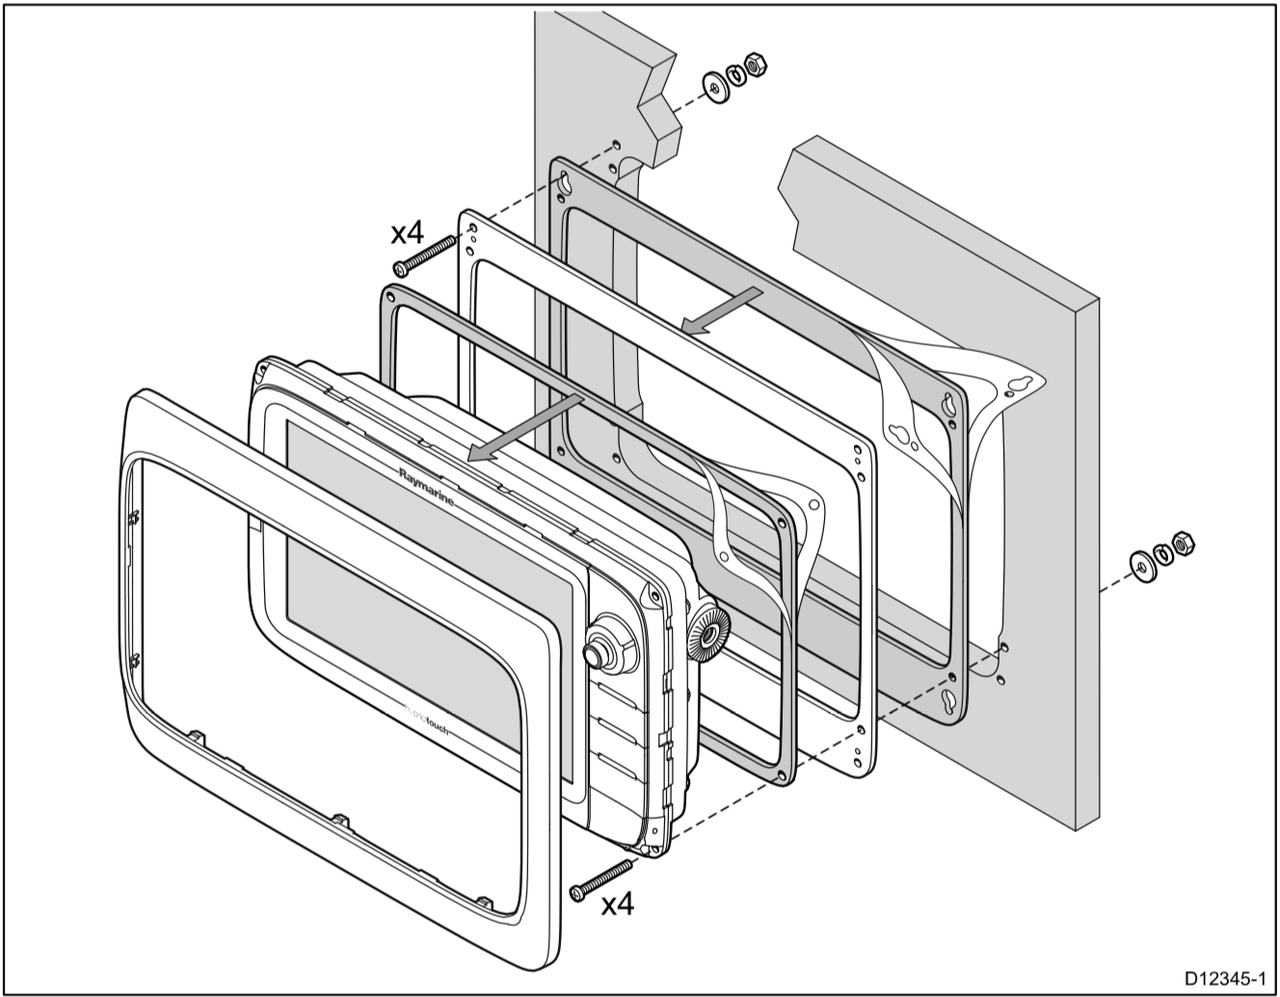 Garmin Wiring Diagram 17 - wiring diagram today review